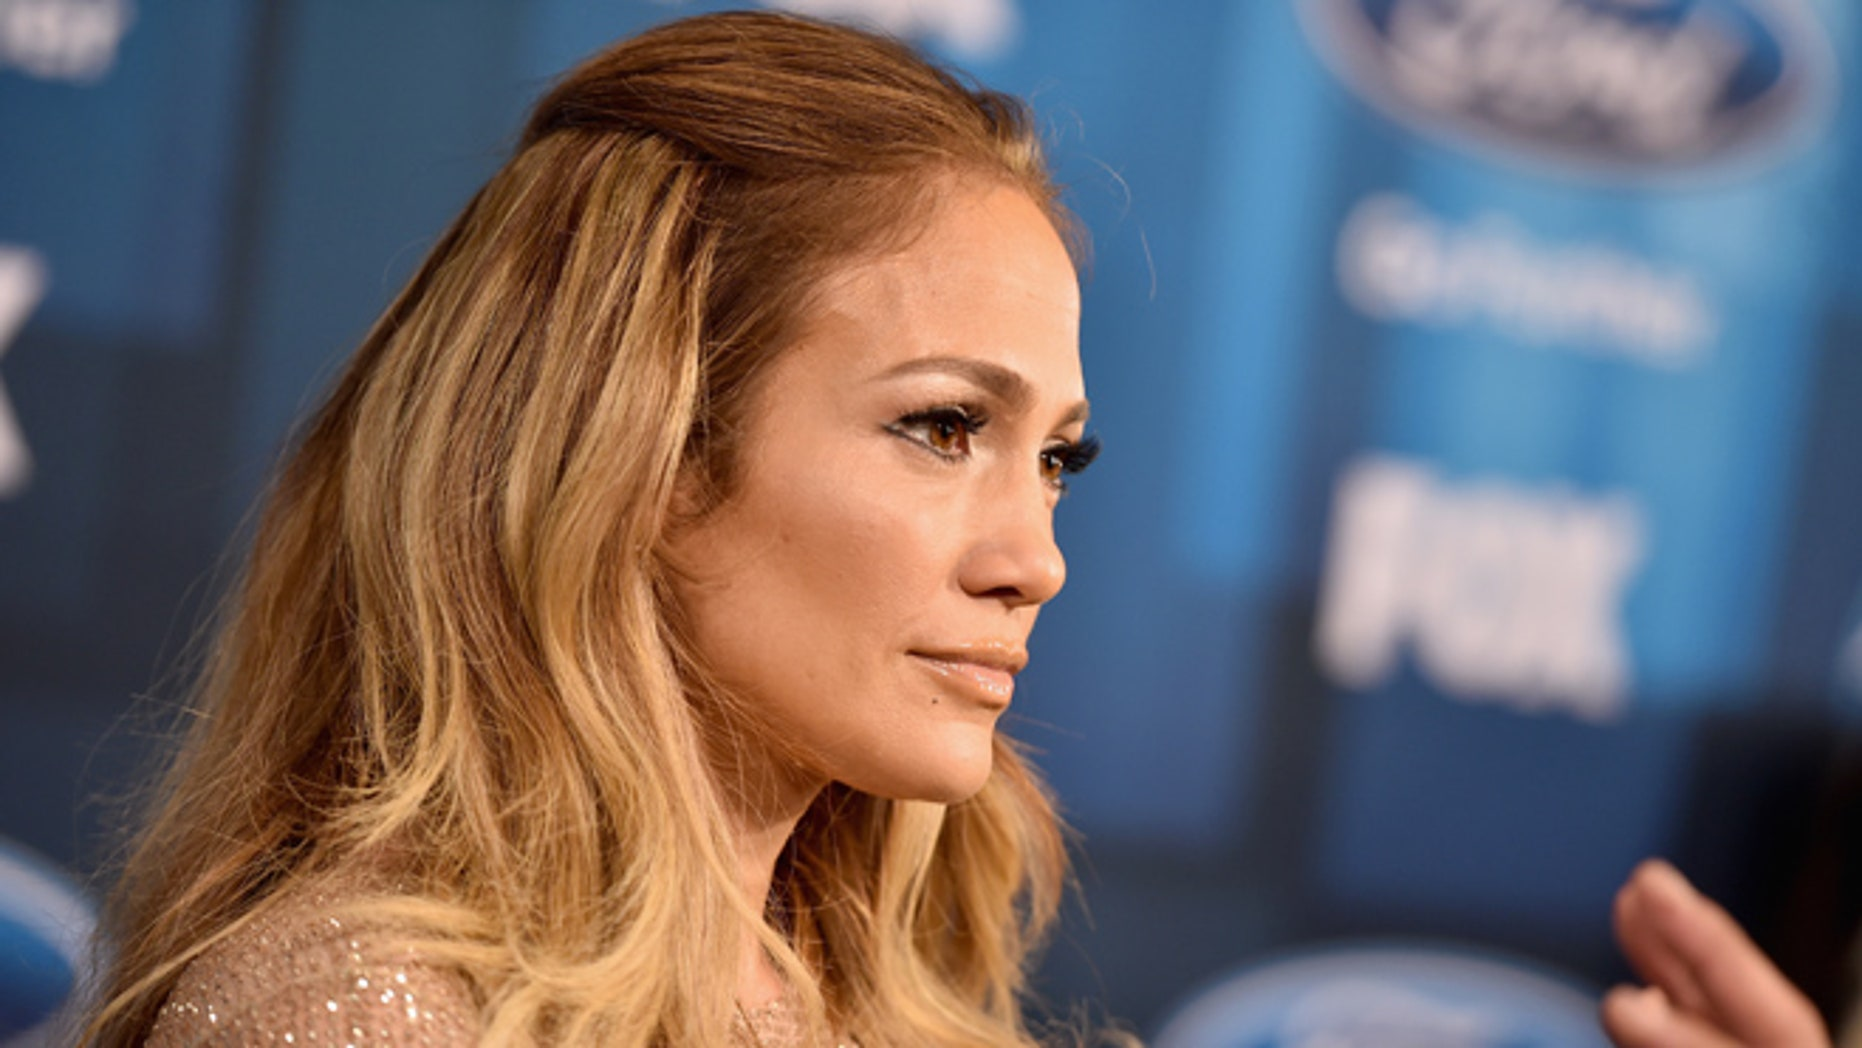 Jennifer Lopez on April 7, 2016 in Hollywood, California.